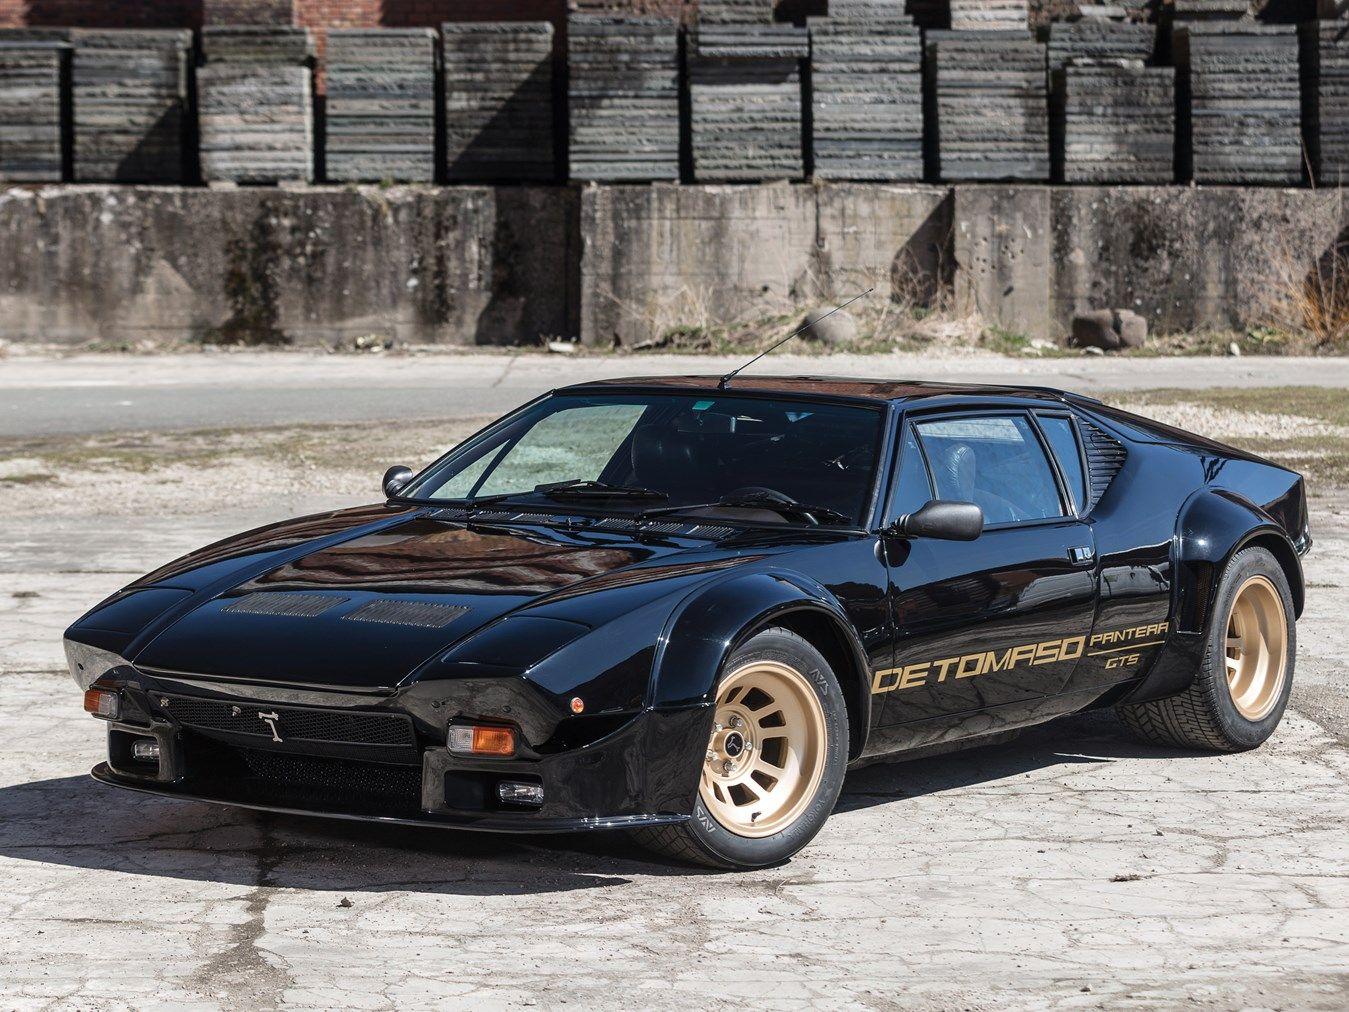 Detomaso Pantera Gt5 Pantera Car Classic Cars Super Cars